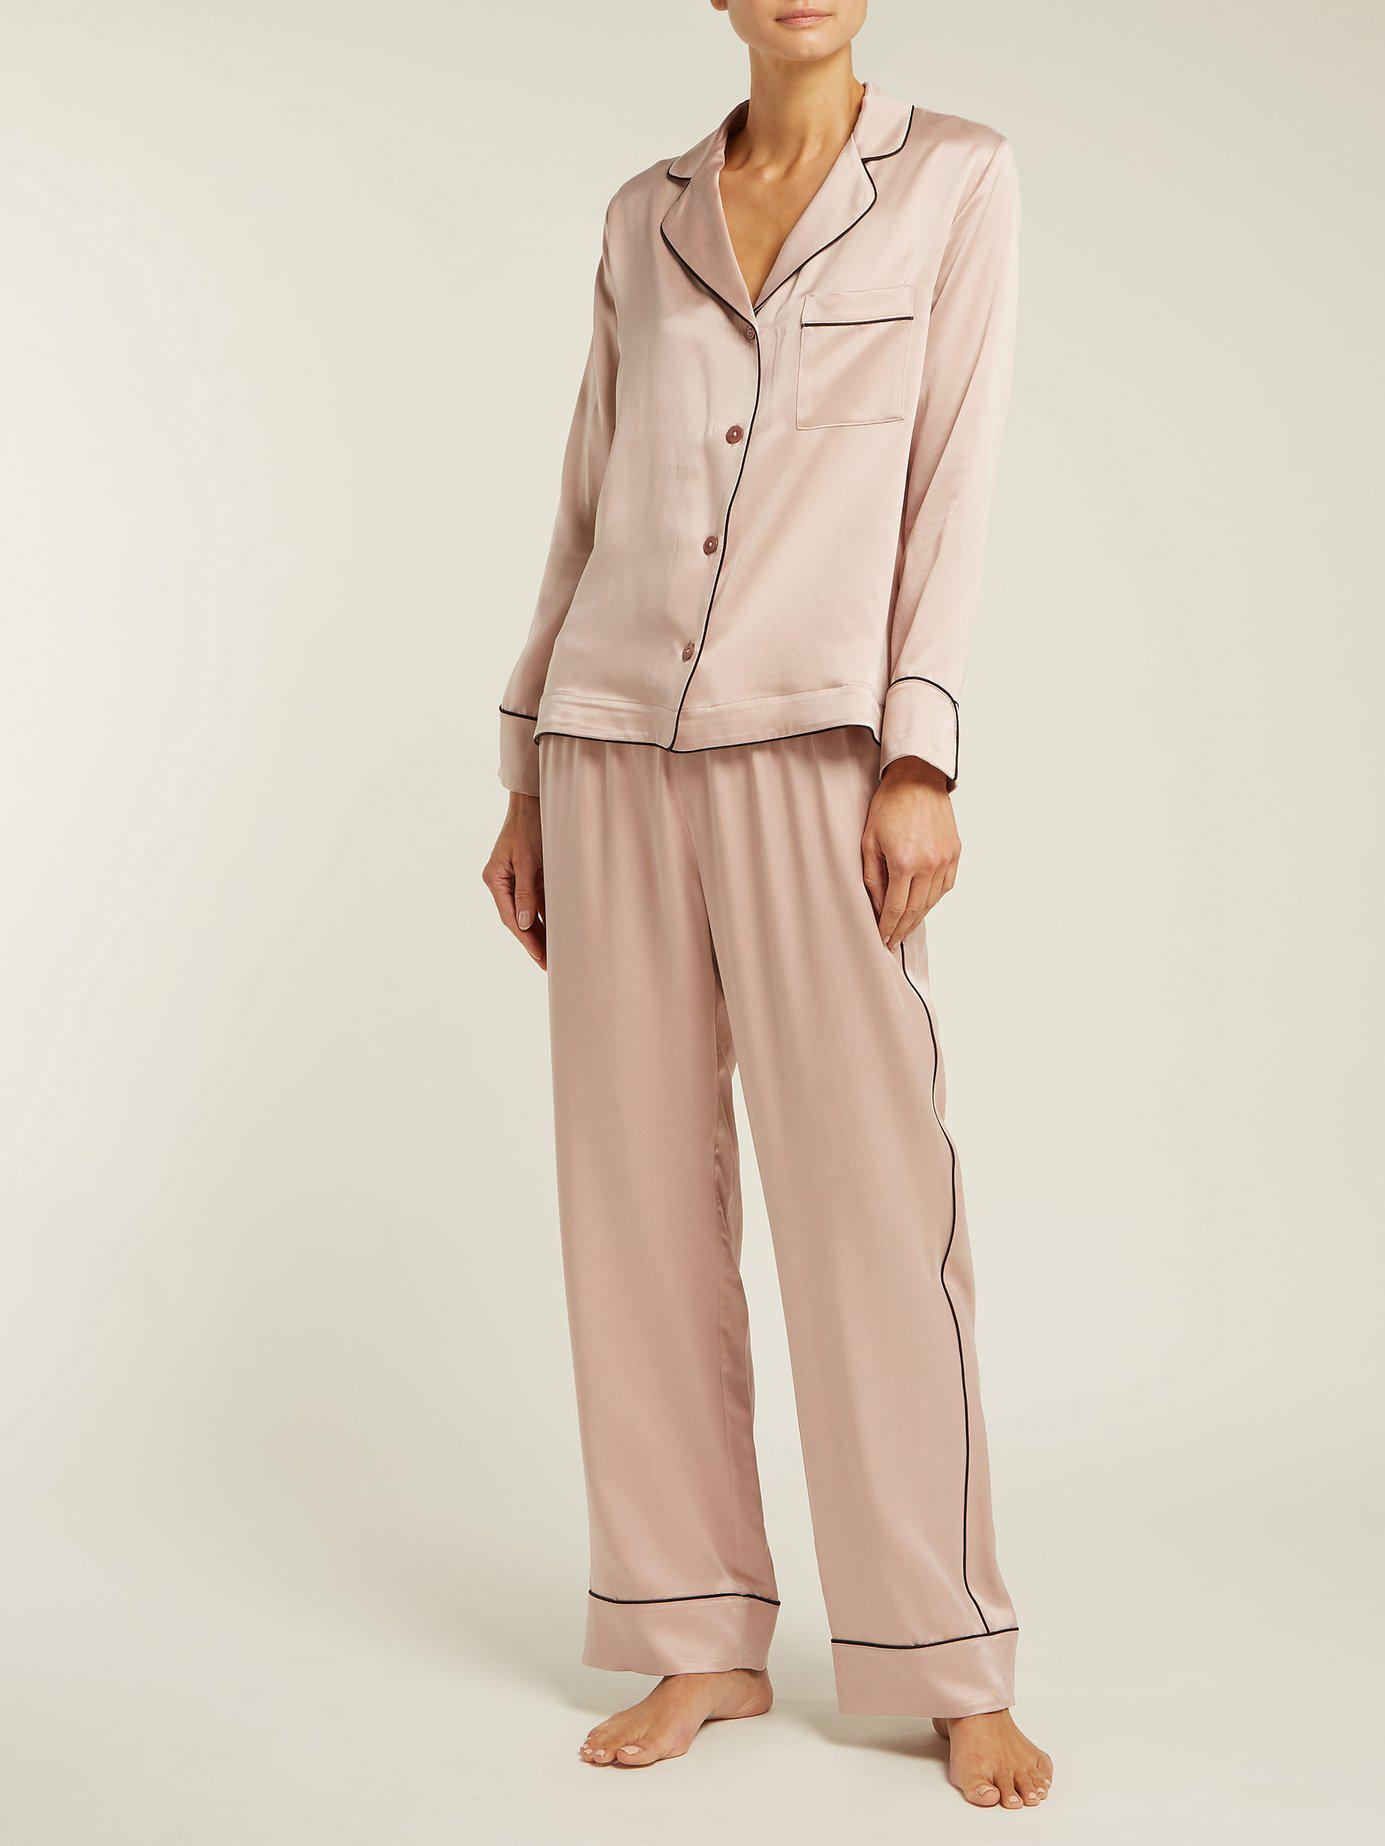 4983054c45 Morpho + Luna - Pink Colette Silk Pyjamas - Lyst. View fullscreen